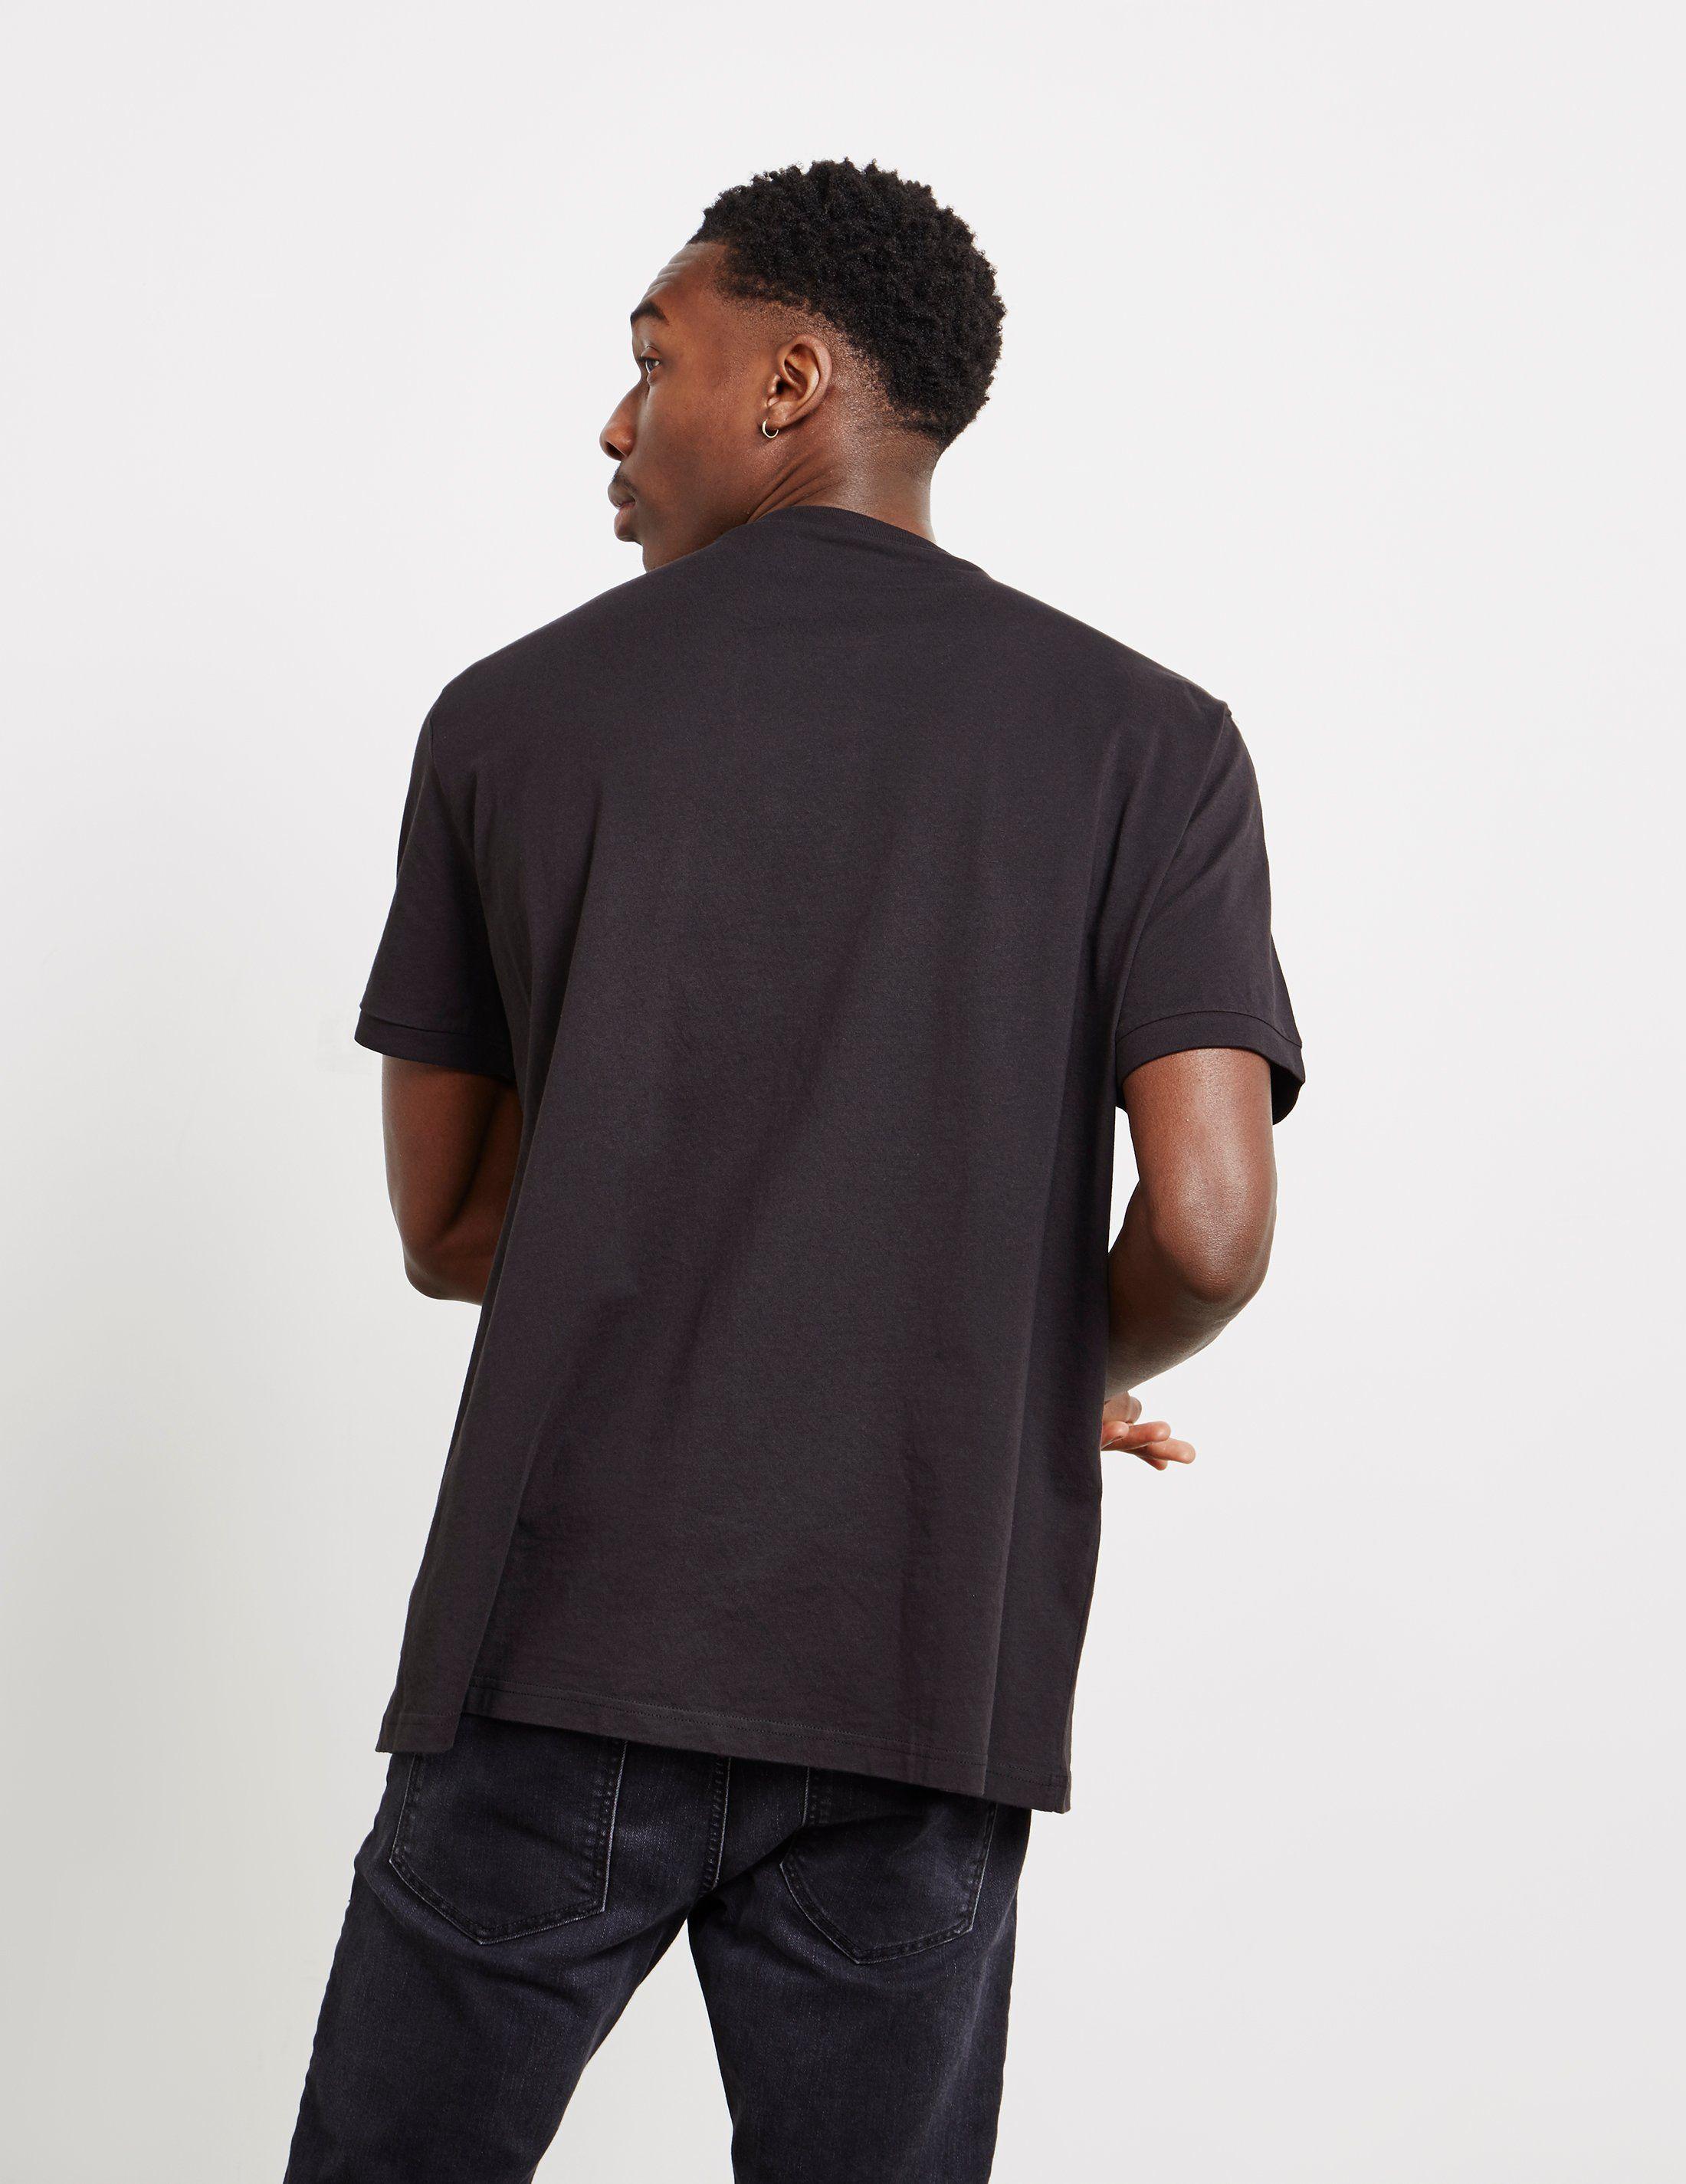 Vivienne Westwood Orb Oversized Short Sleeve T-Shirt